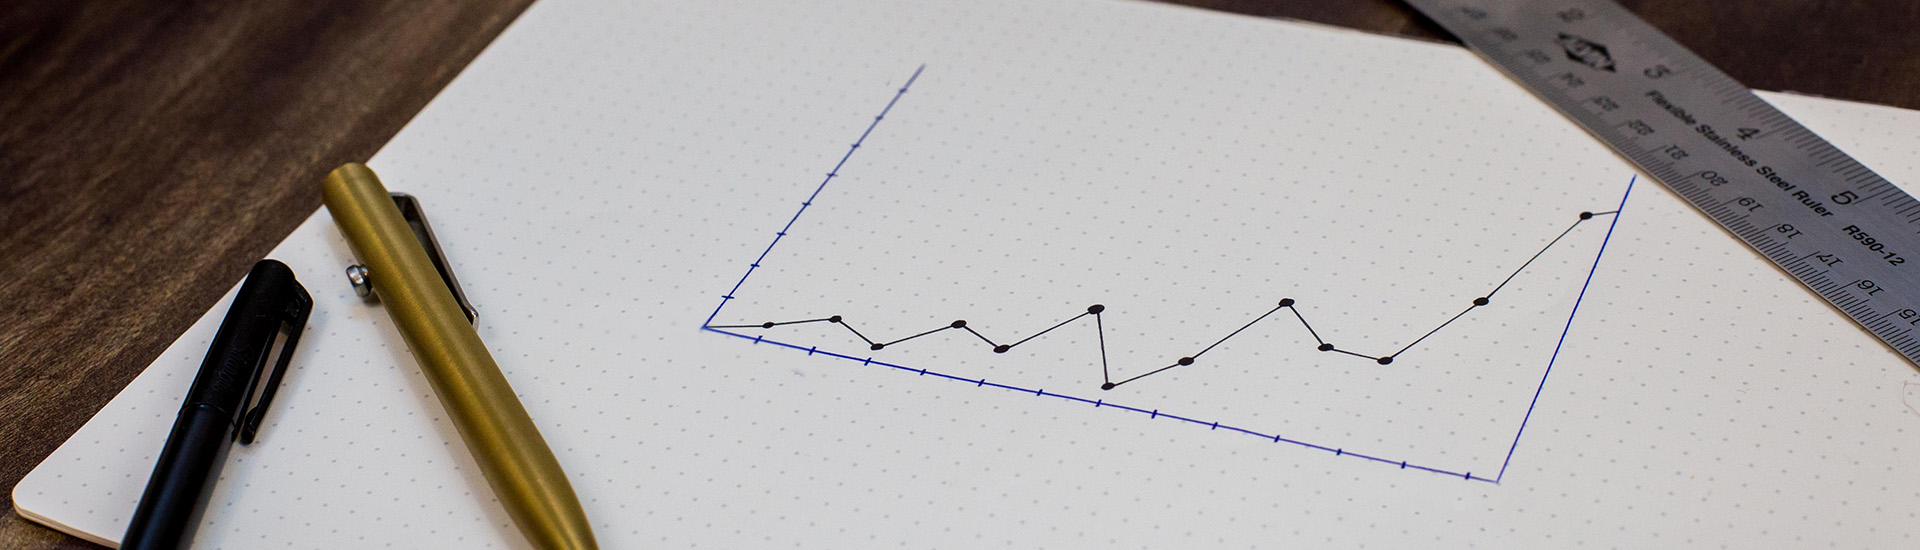 graph-moving-upwards